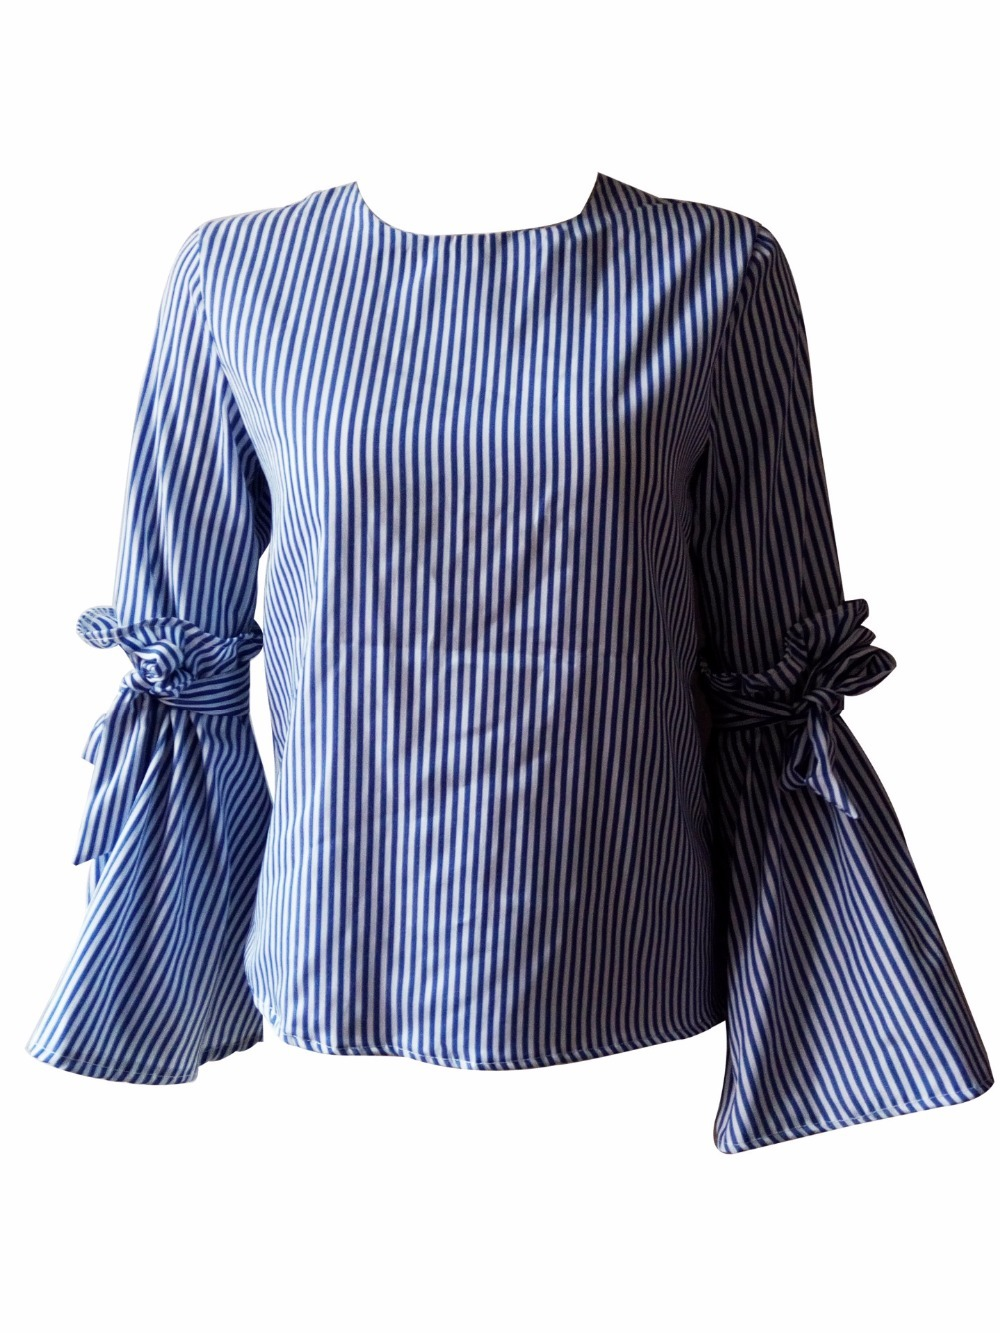 Las Woherb Mujeres 2019 Nuevas Blusa Corto Blusas 73816 Blanco Color Encaje Camisa Mangas Photo Slim Mujer América Rayas Azul Primavera Europa De pvzP8p